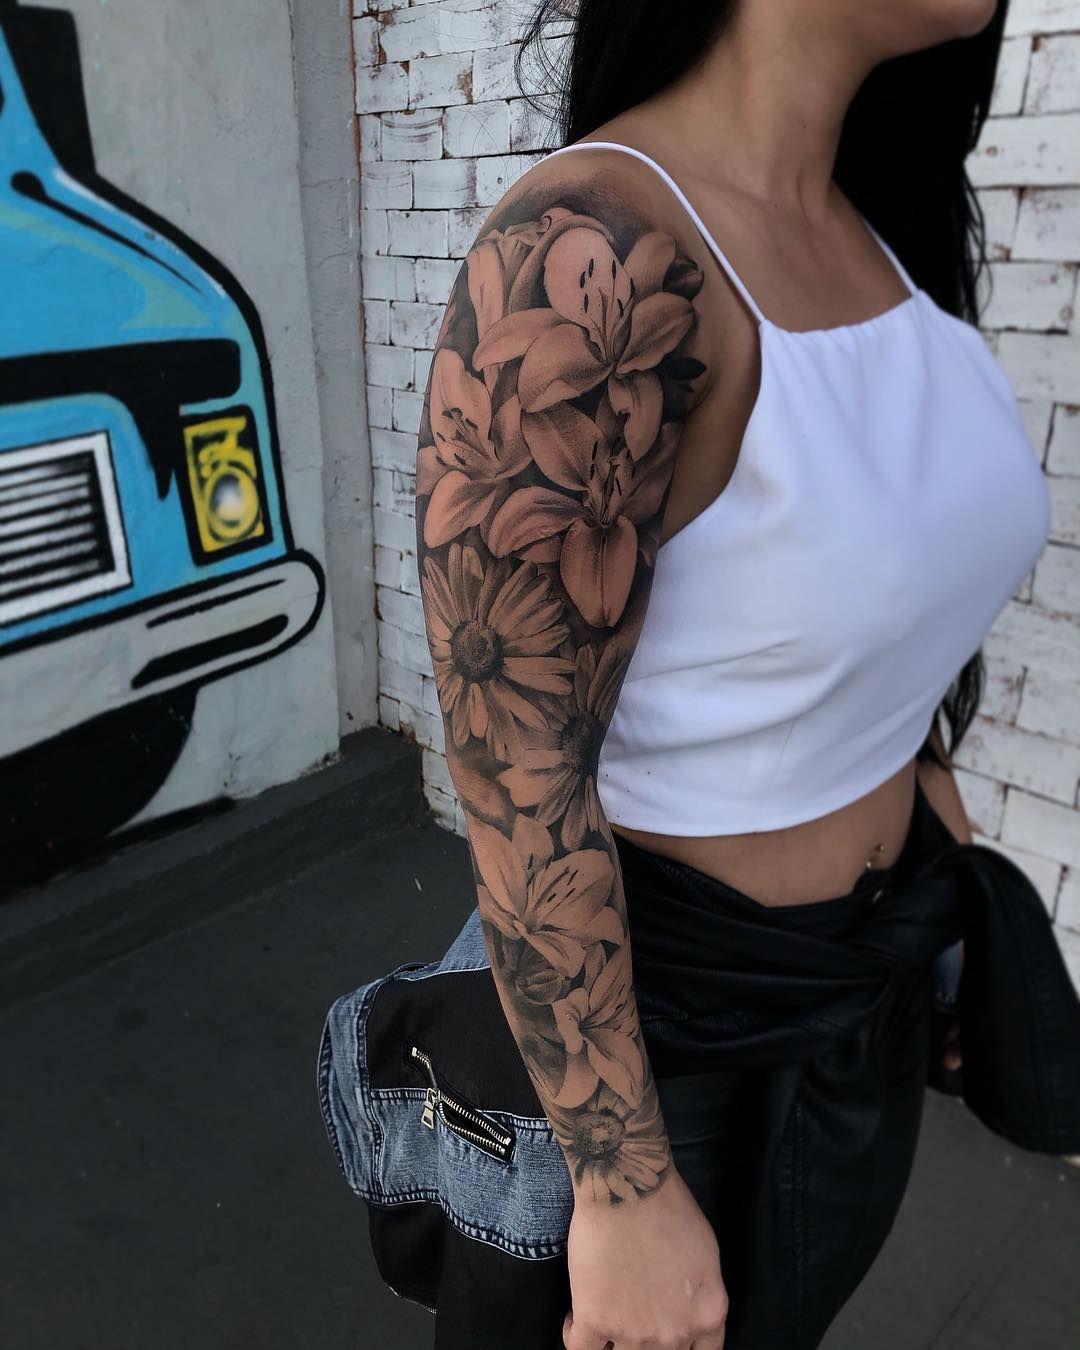 Fullarm tattoo tatuagem feminina fechamento feminino